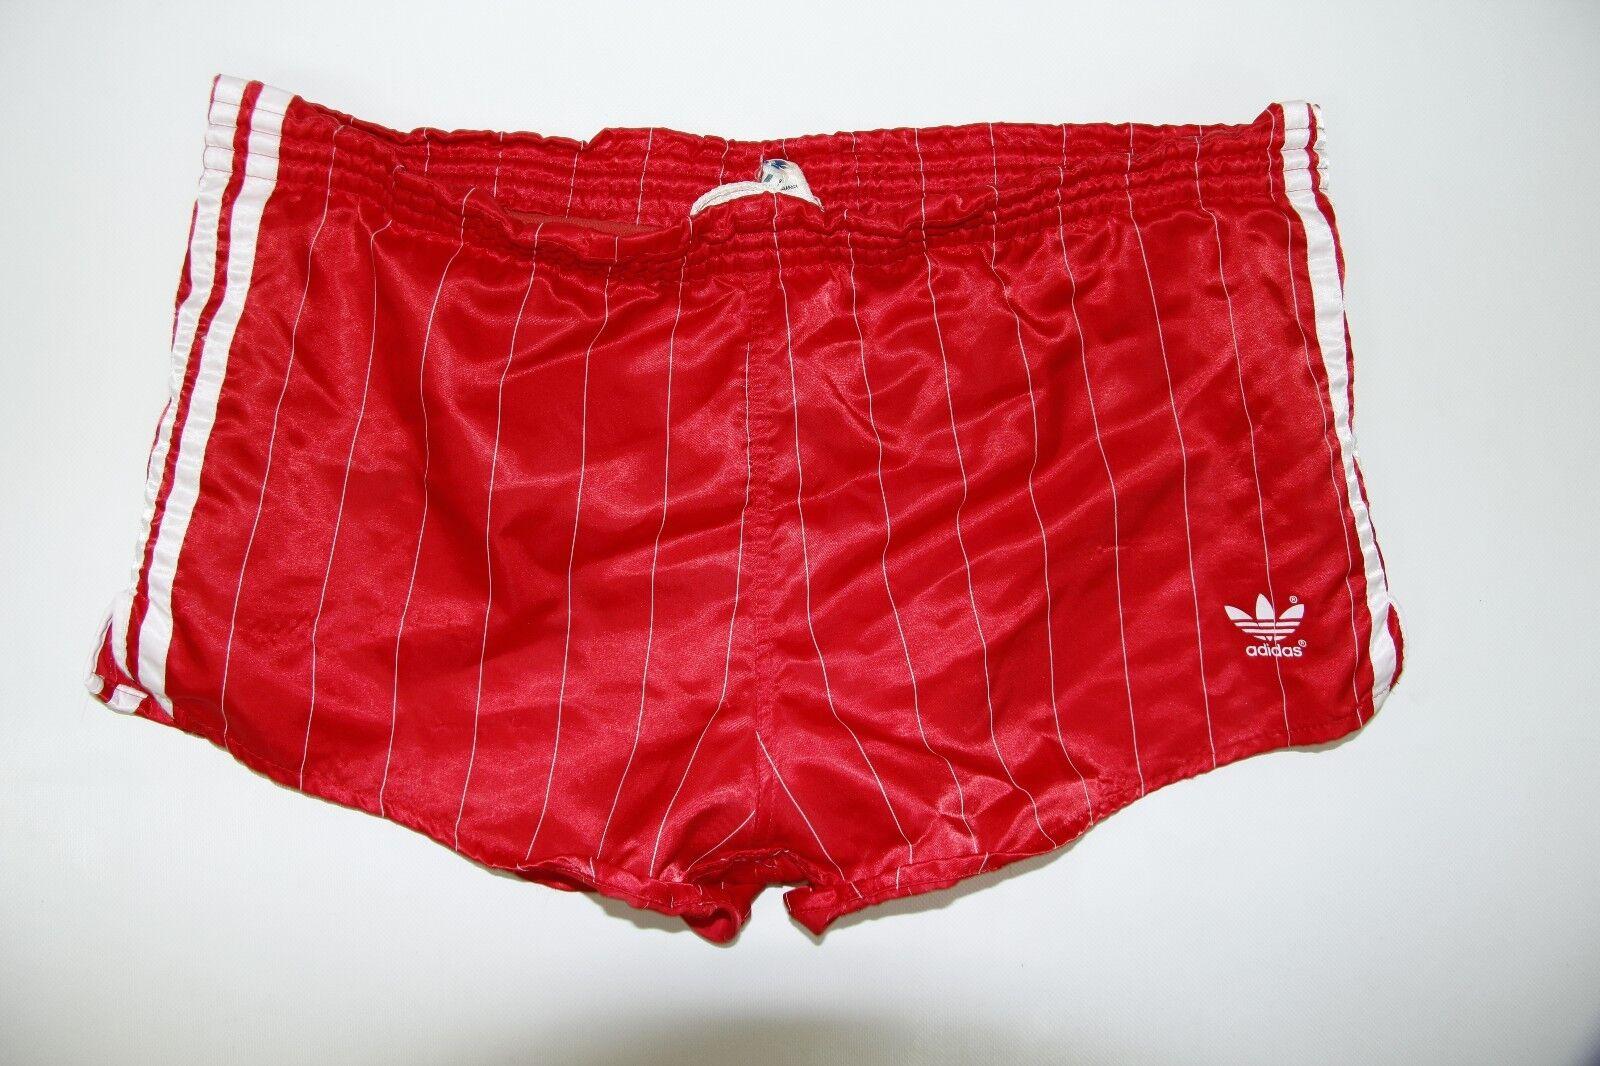 Vintage Retro Adidas Men's Made in W.Germany Classic Glanz Nylon Shiny Shorts 6